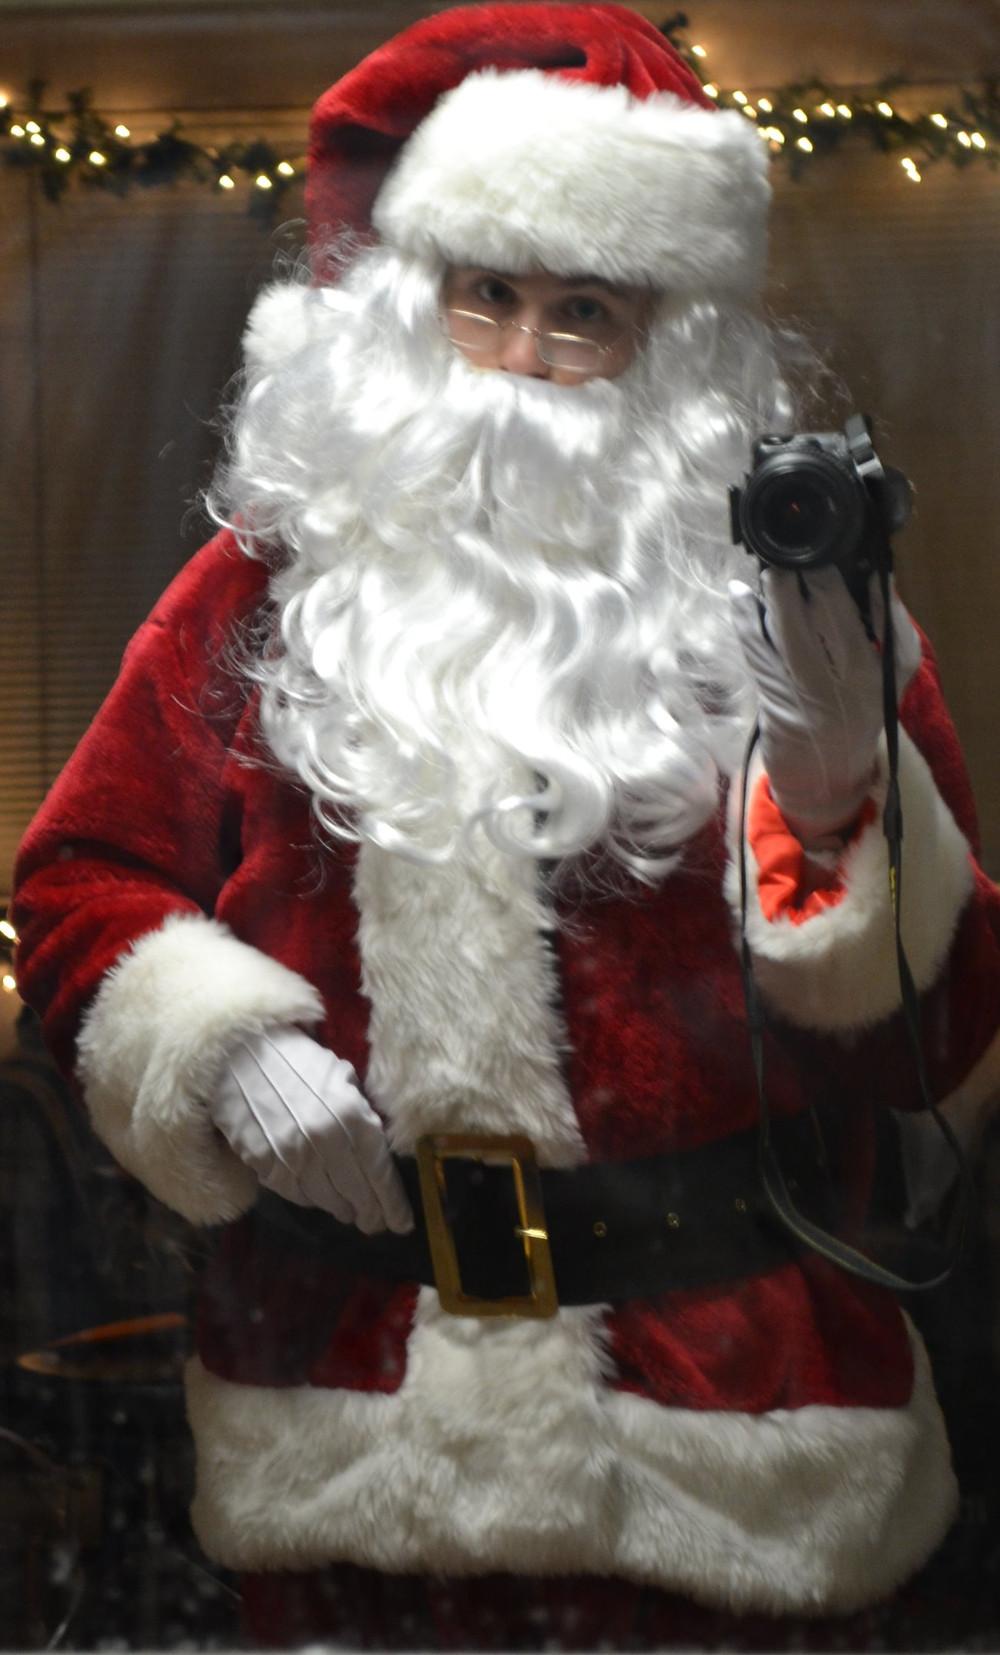 Horrid looking Santa Claus